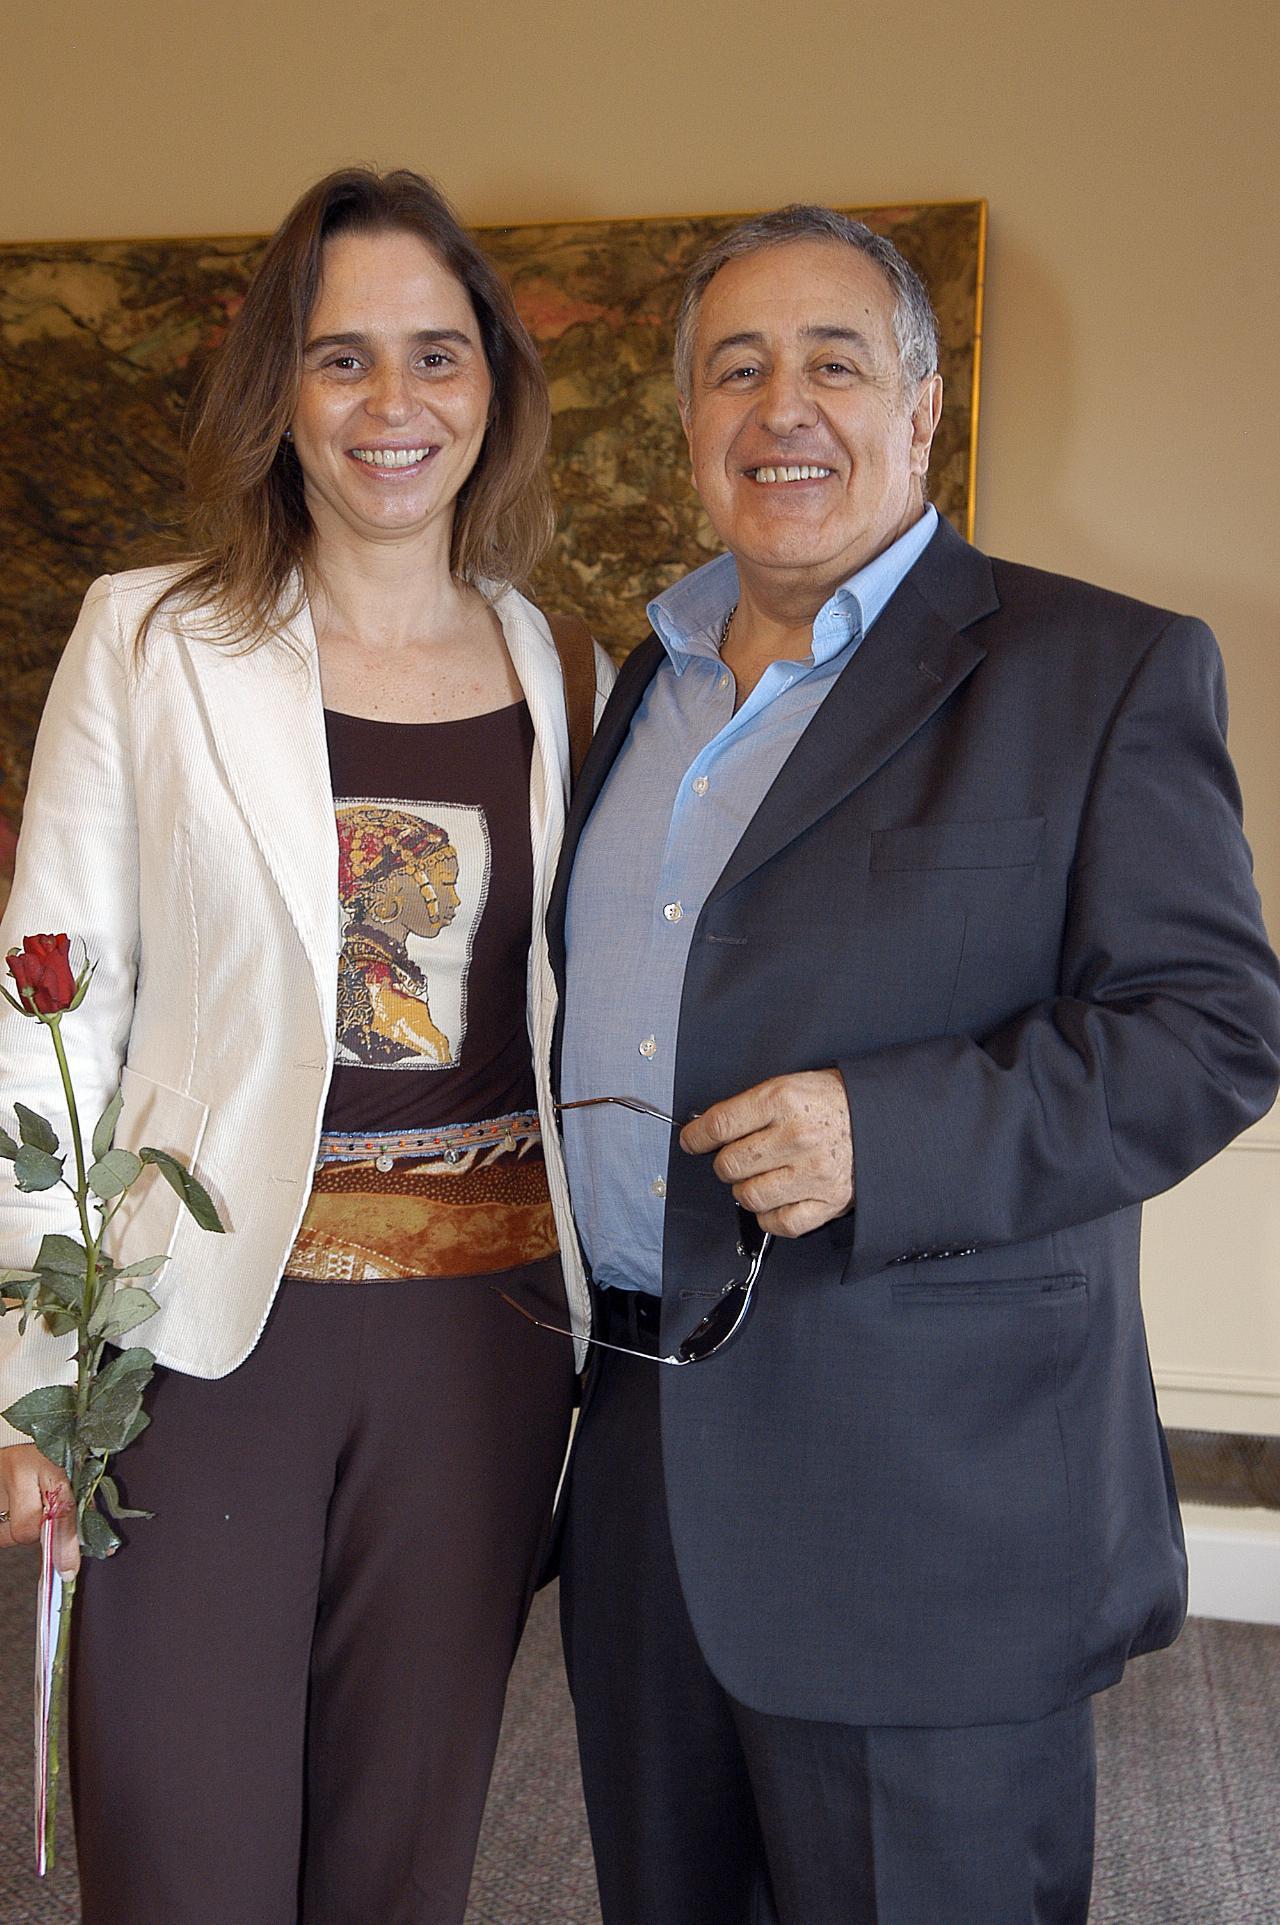 Mafalda Bessa e Nicolau Breyner